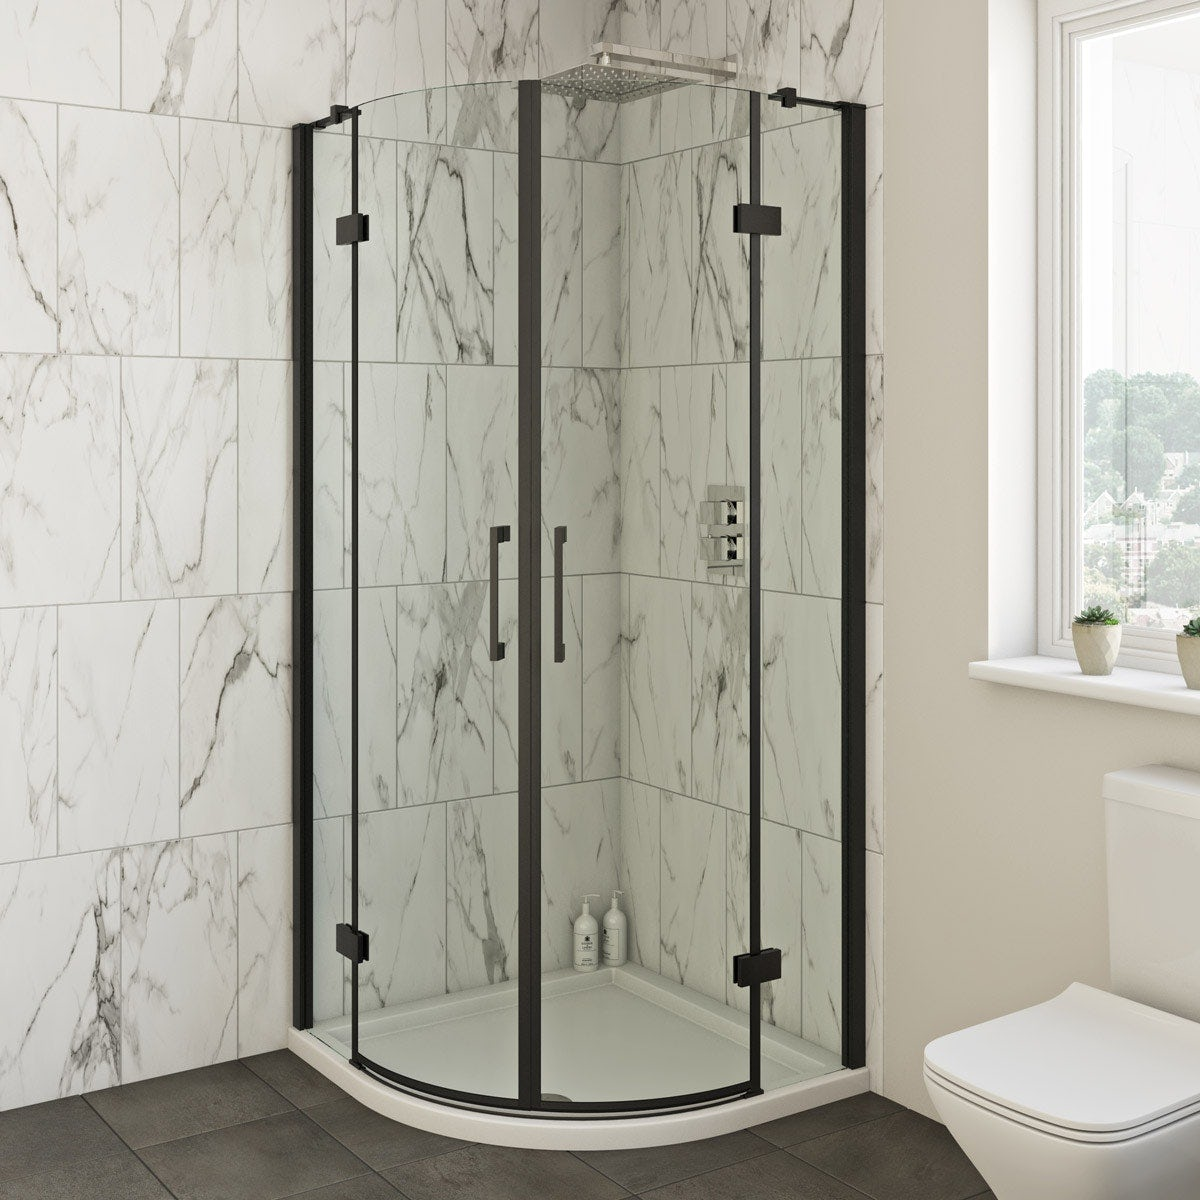 Shower Cubicles Plan: Mode Cooper Black Hinged Quadrant Shower Enclosure 900 X